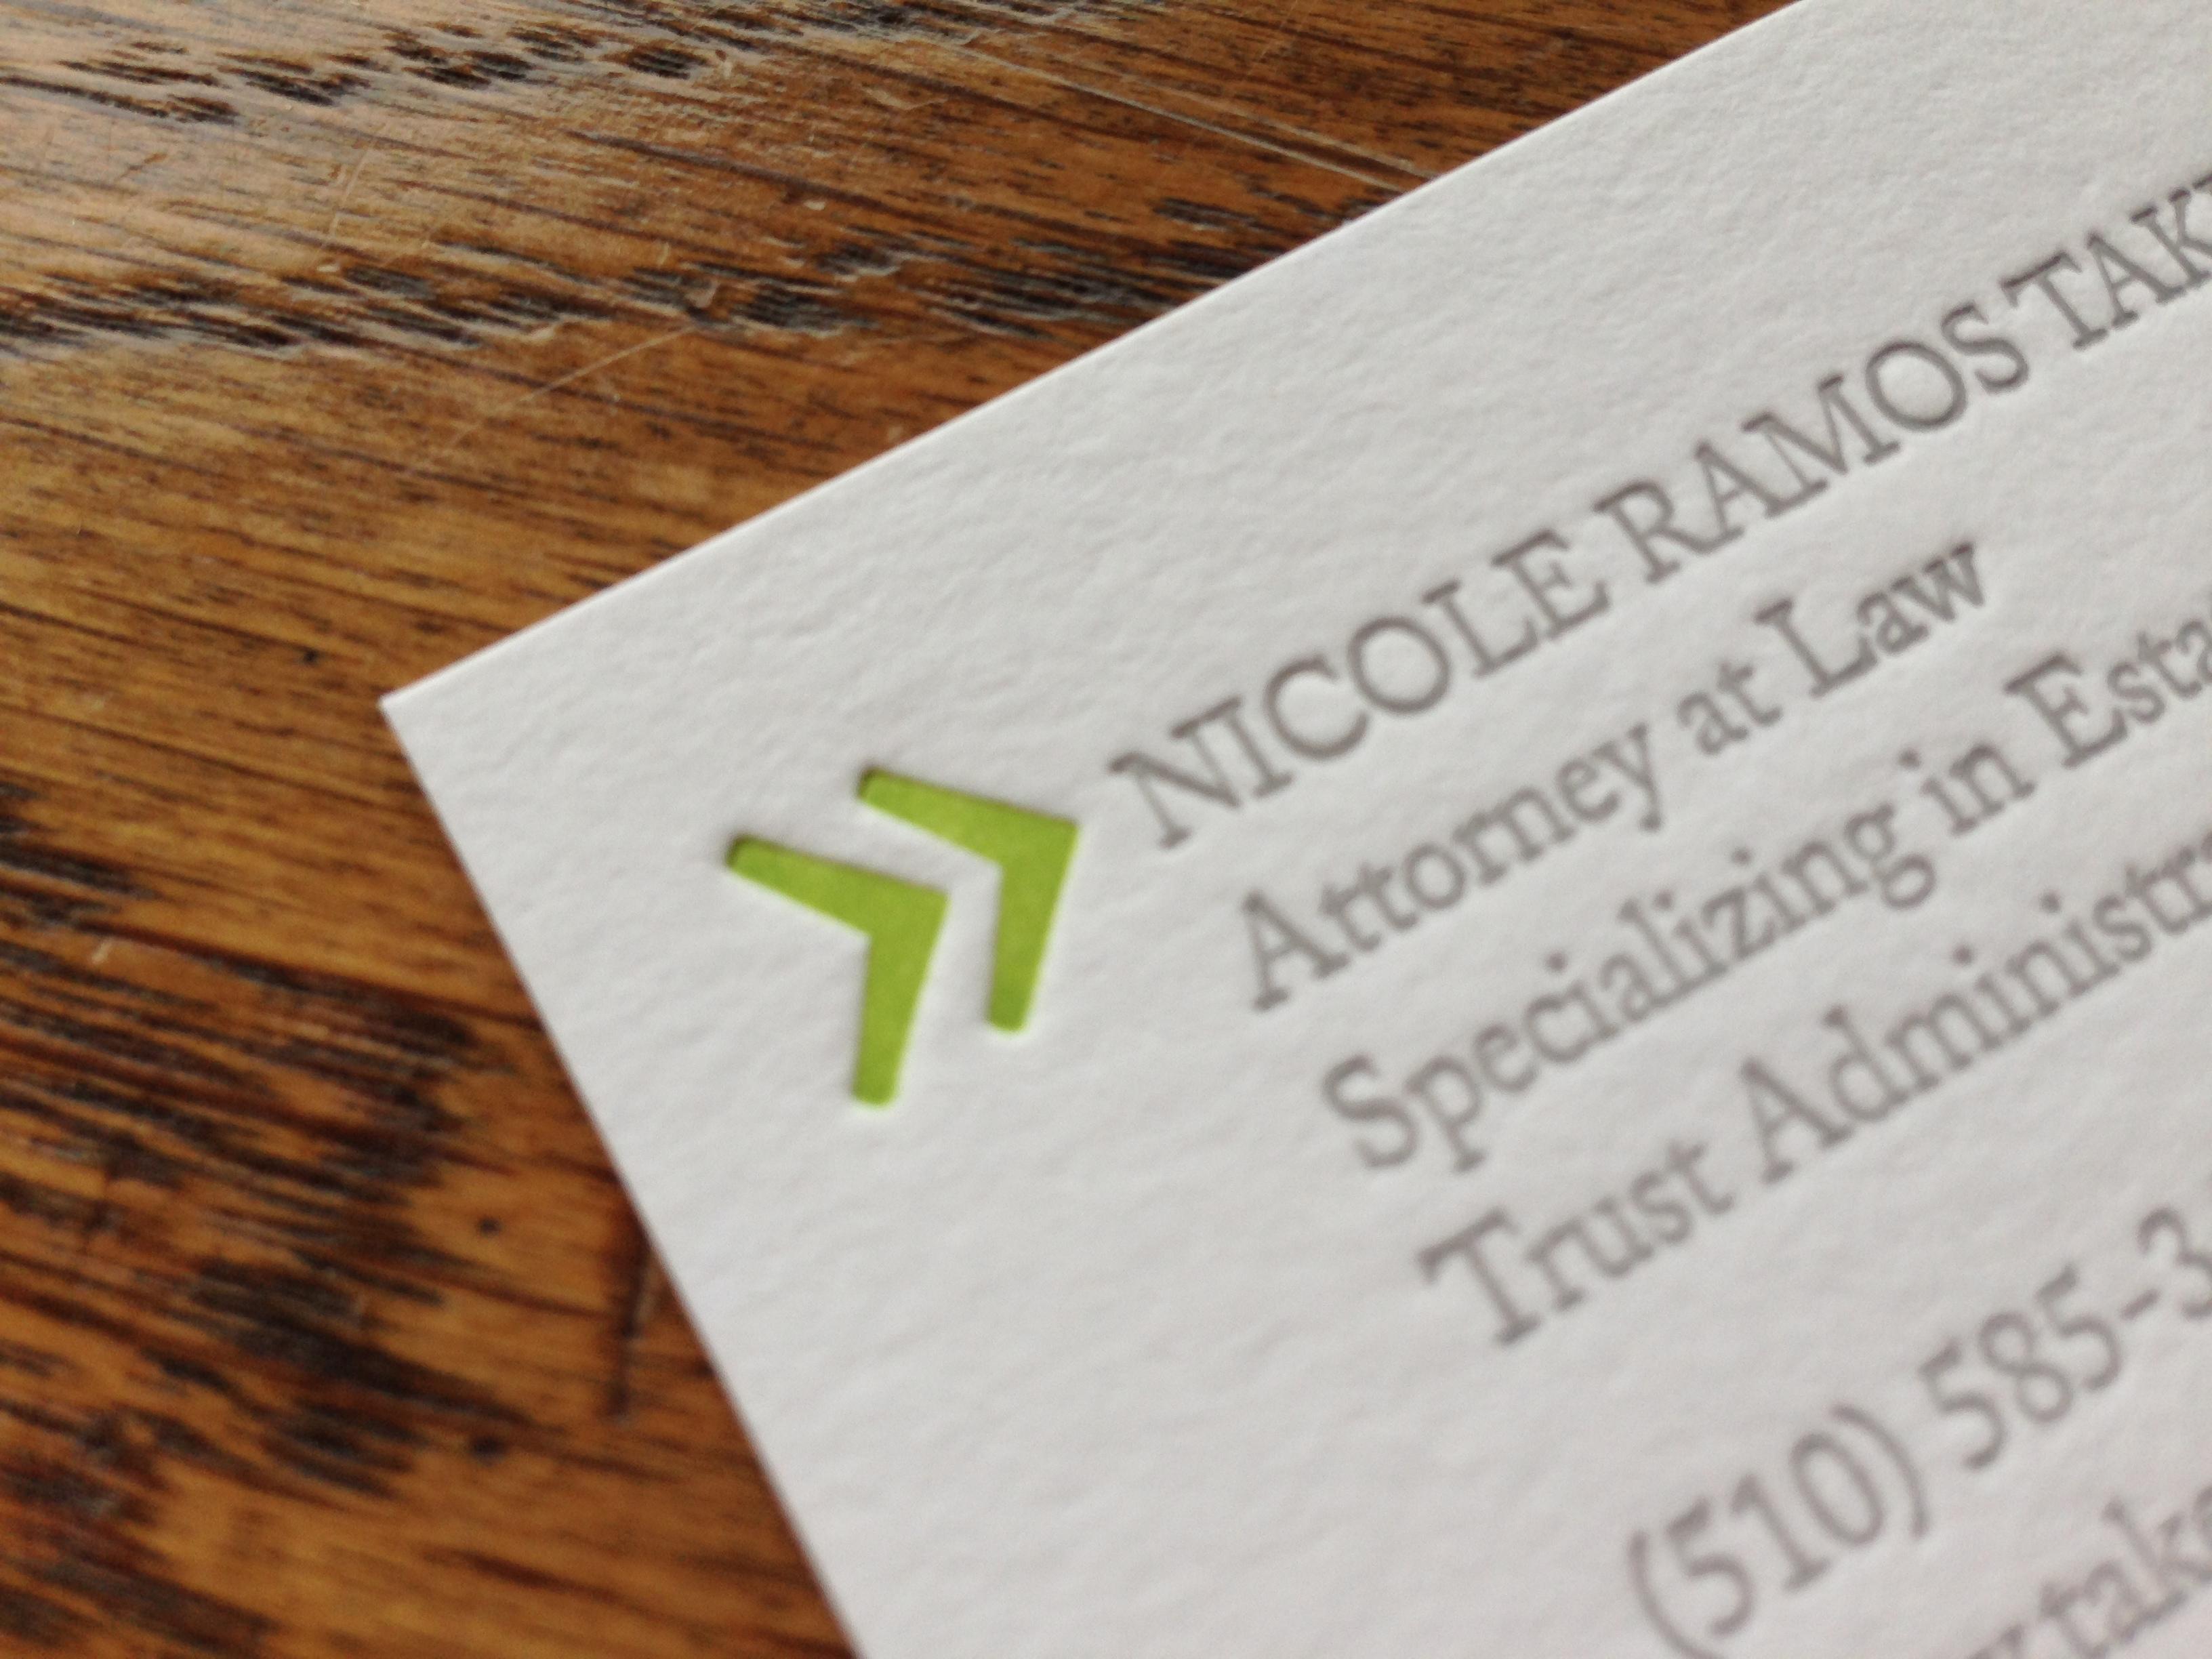 Custom letterpress business cards 622 press letterpress goods img3223 colourmoves